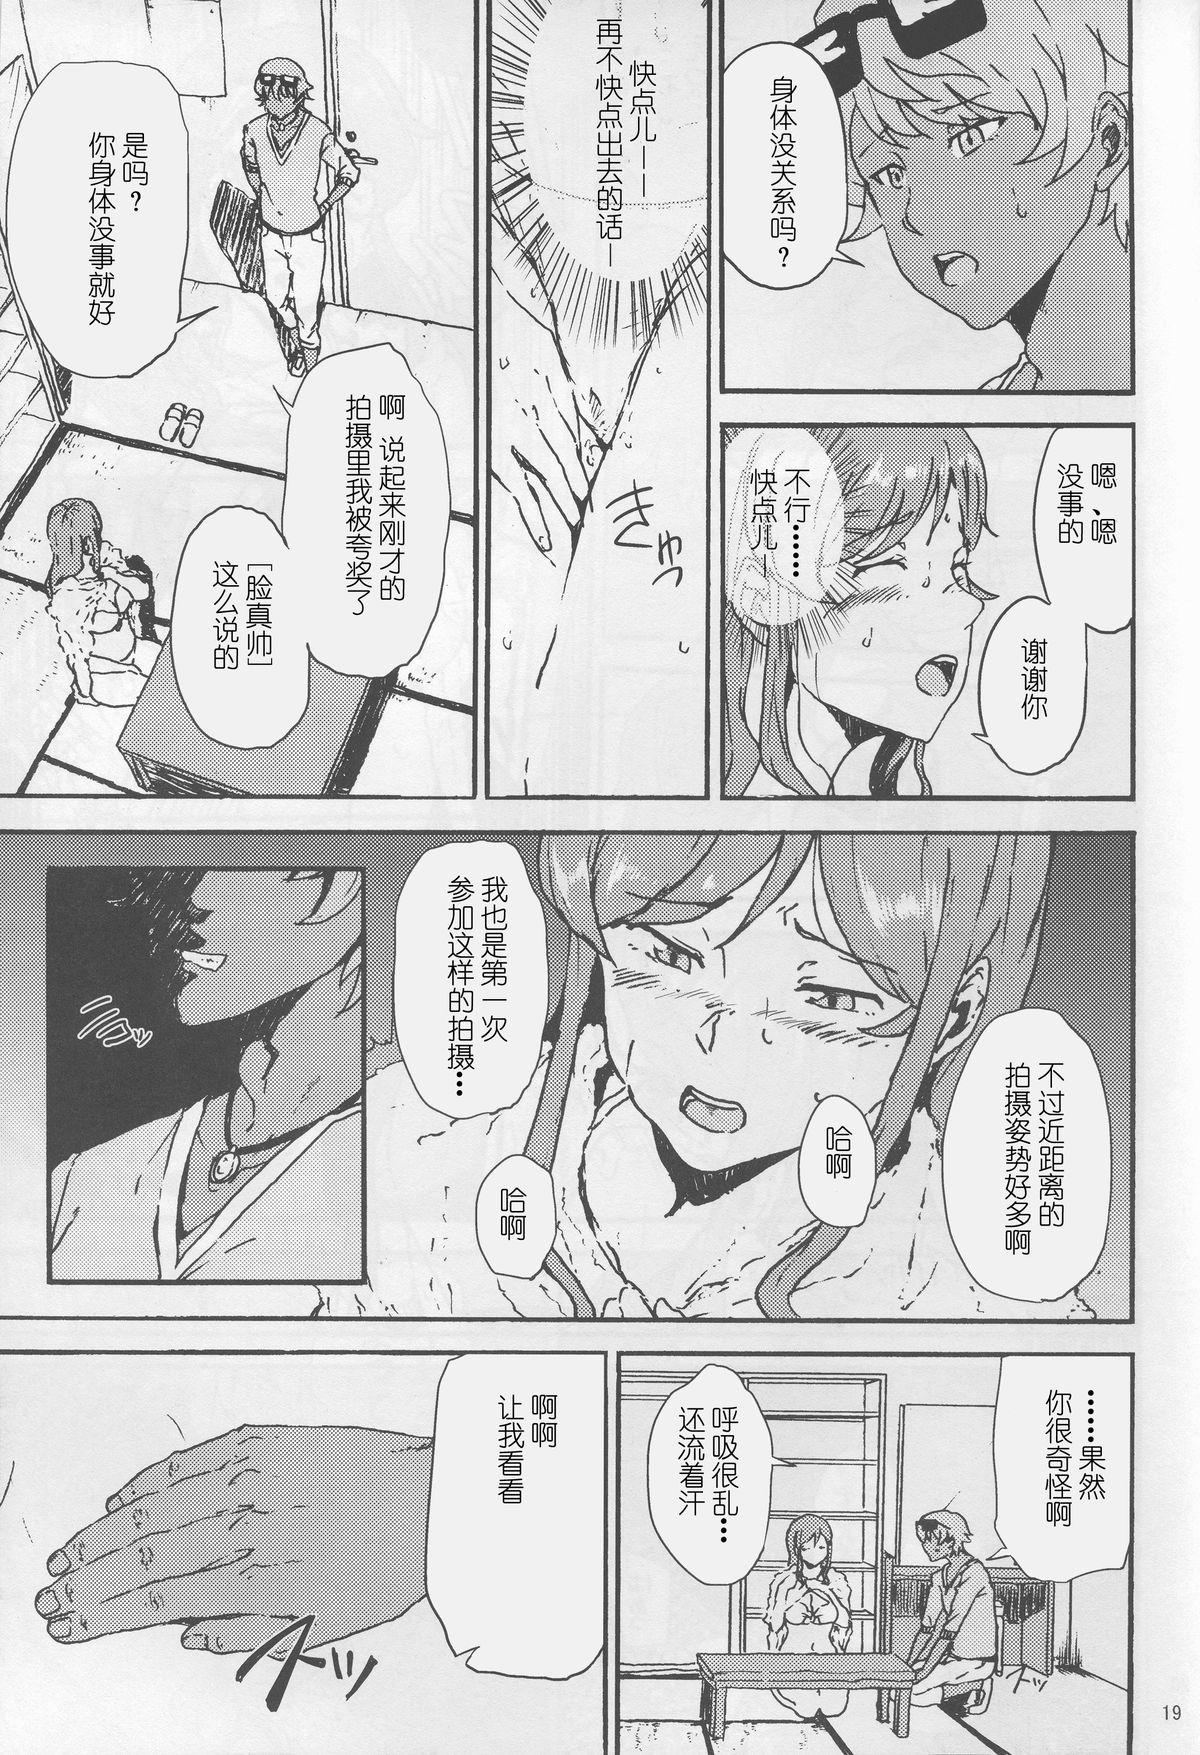 Mirai-chan ga Sandaime SGOCK no Leader ni Damasare Yarechau Hon 19